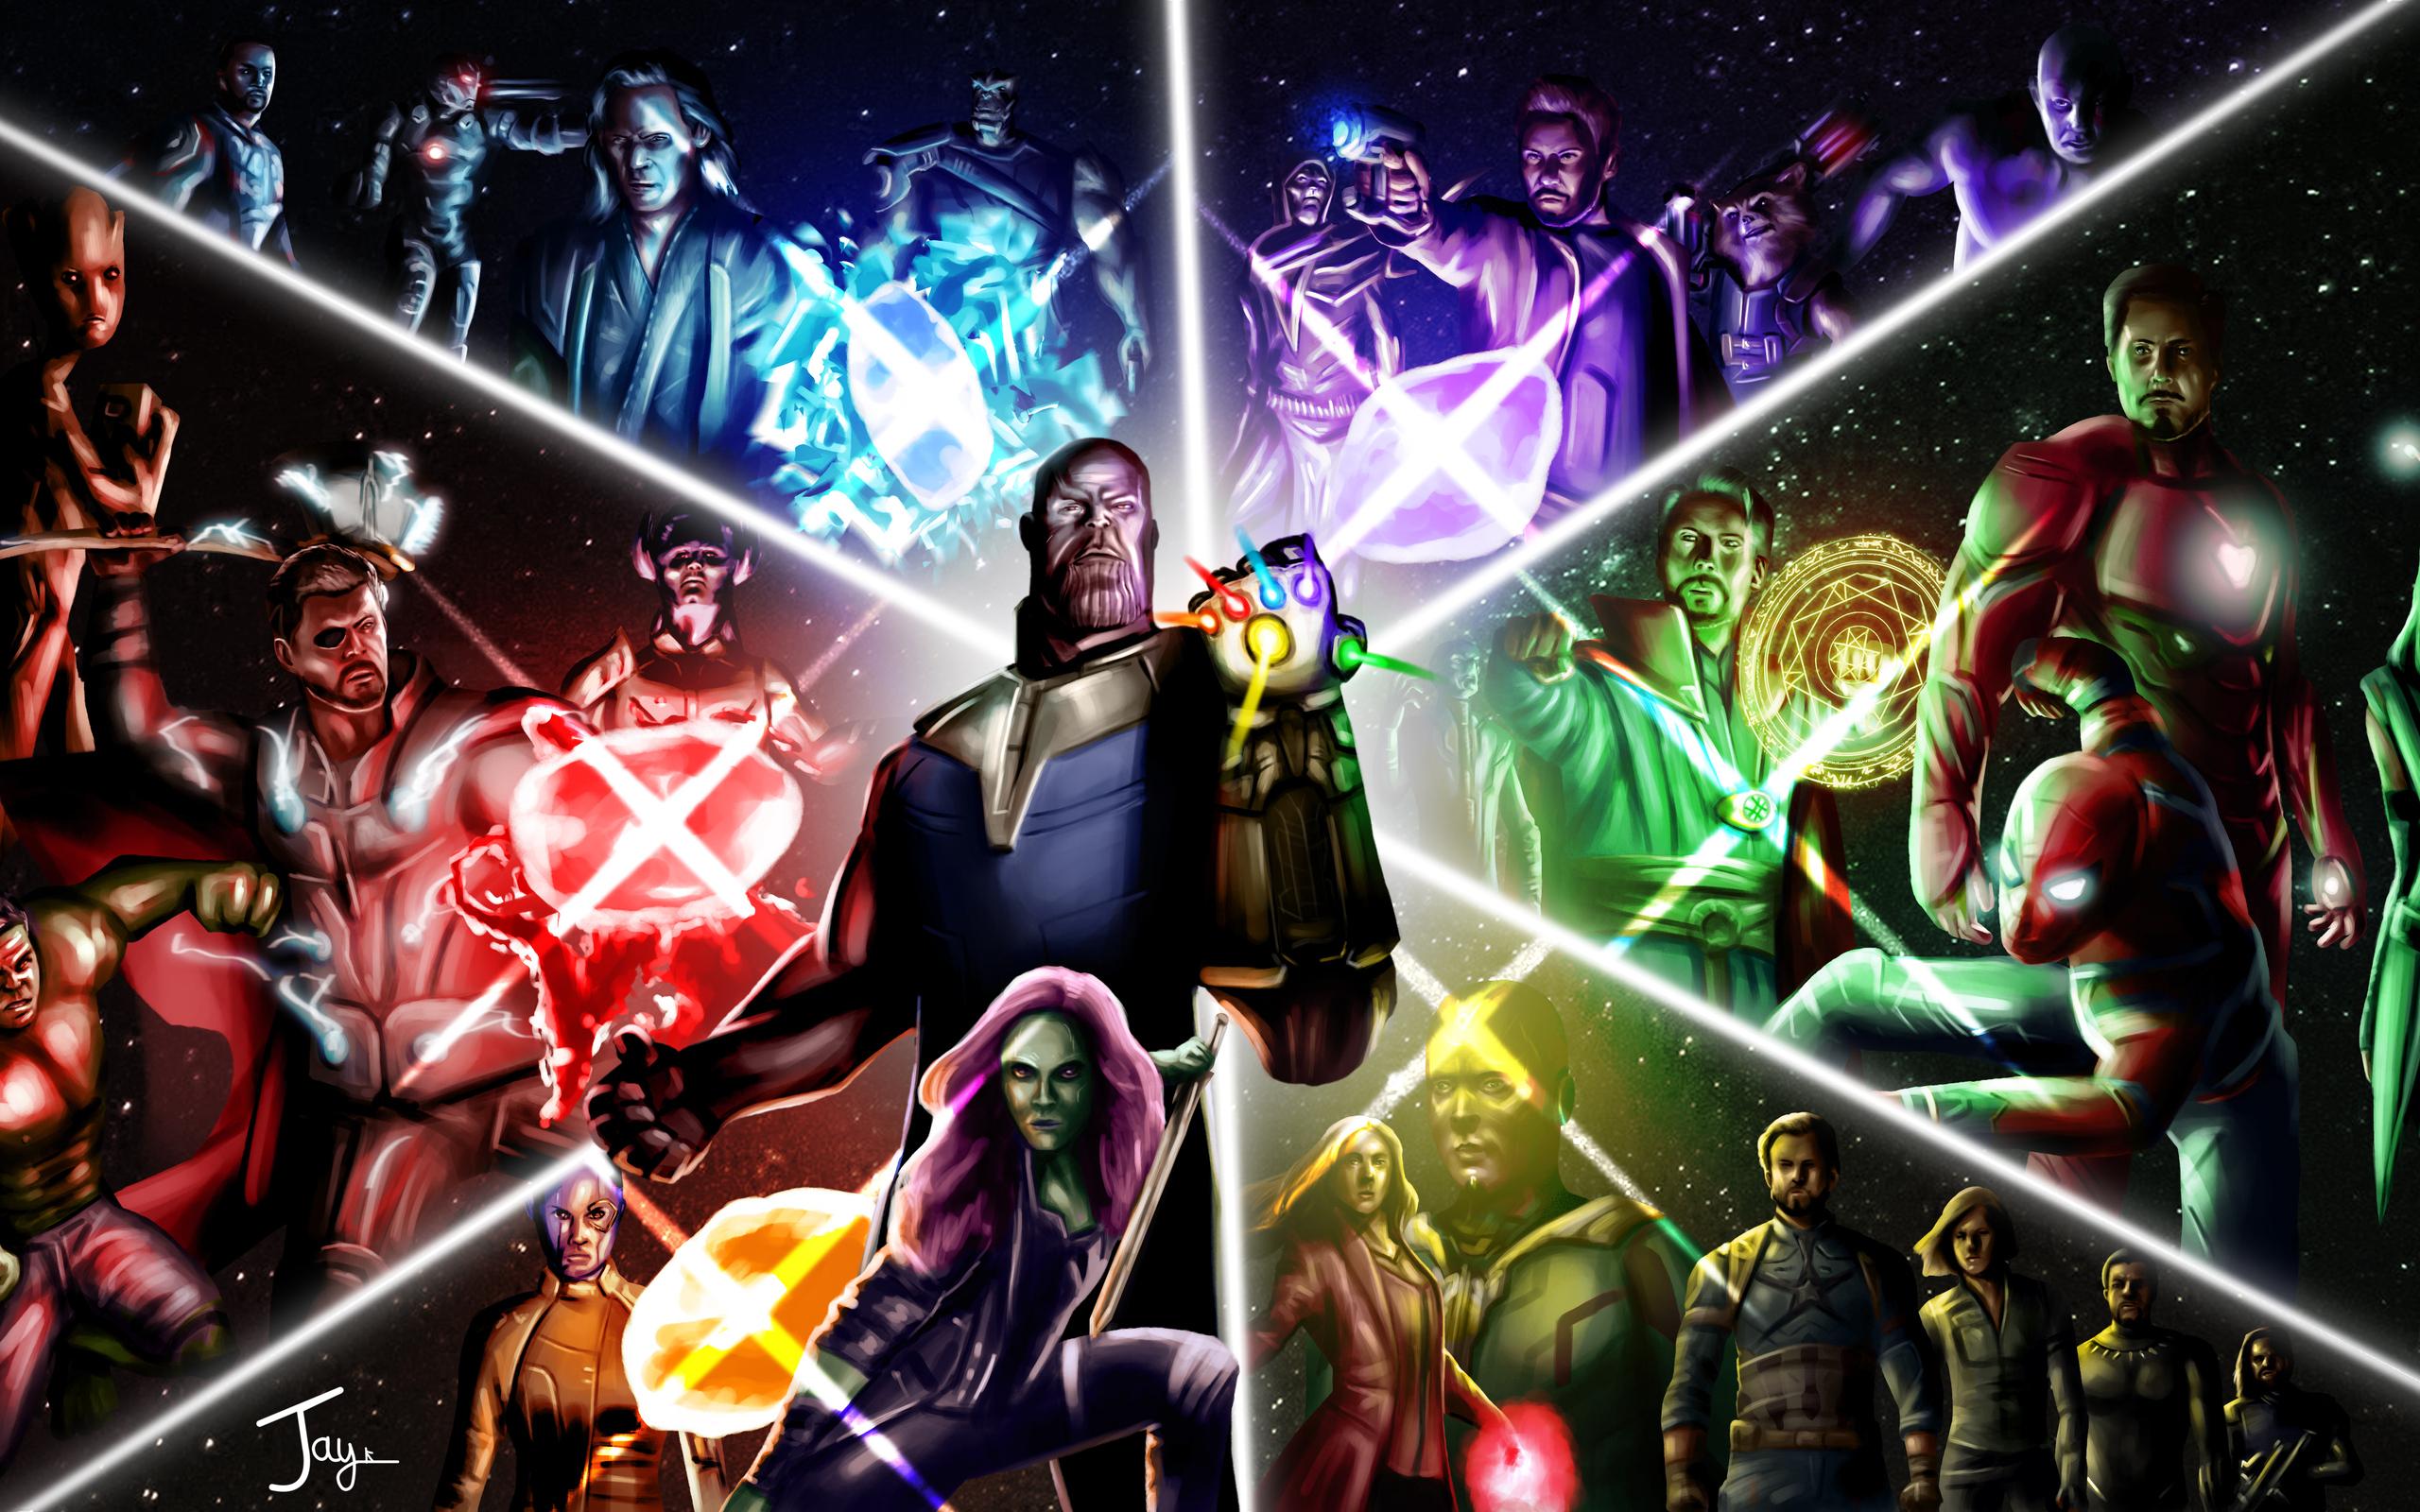 avengers-infinity-war-poster-digital-painting-em.jpg